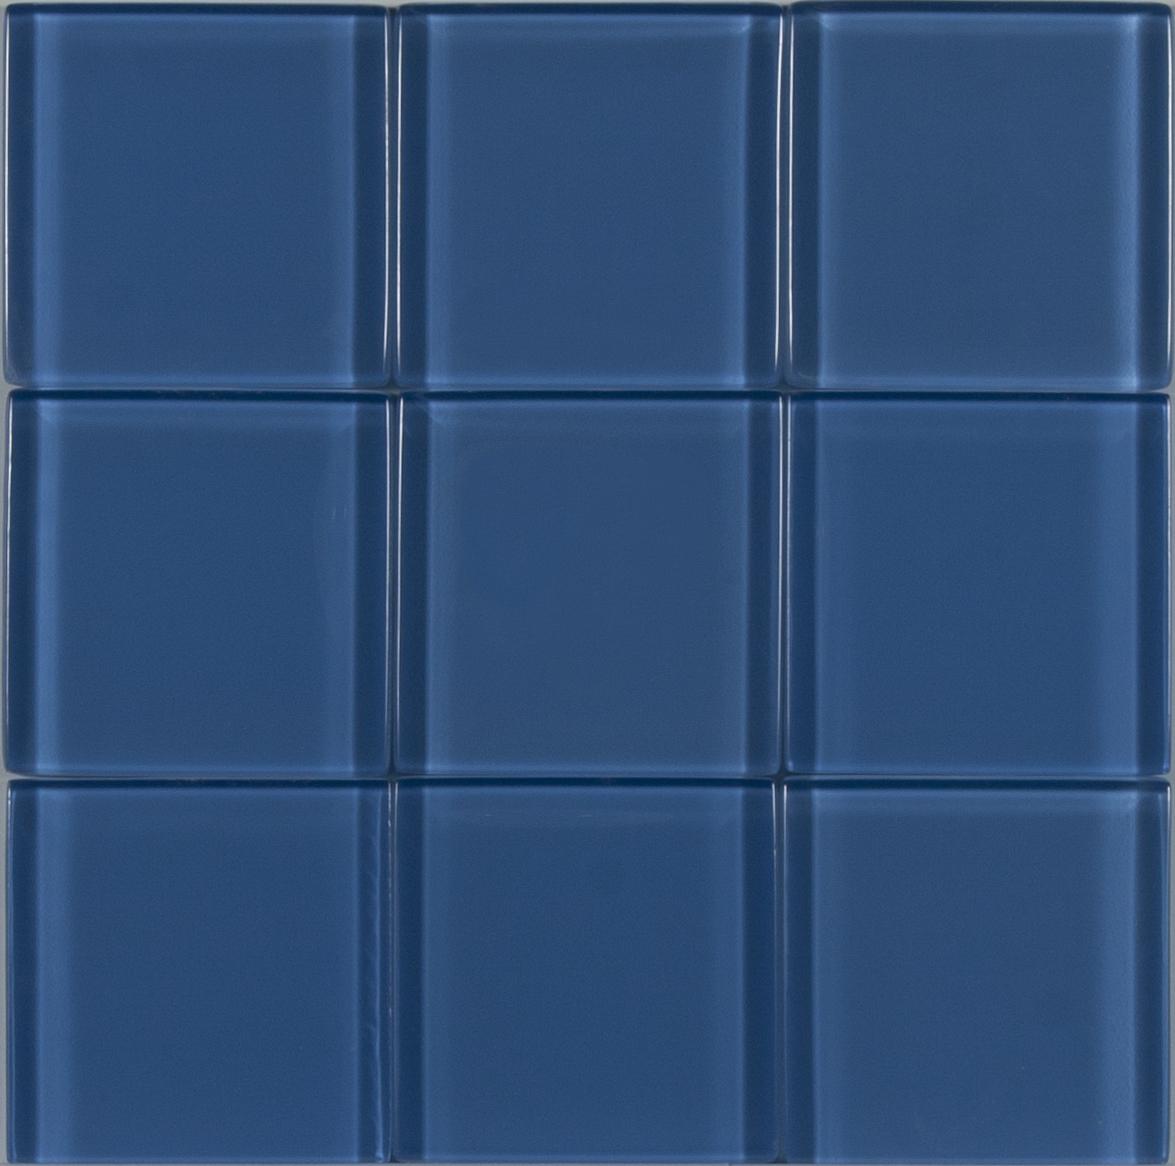 Stone Design - Glass Tile Clearance - Blue Zircon - CLEARANCE